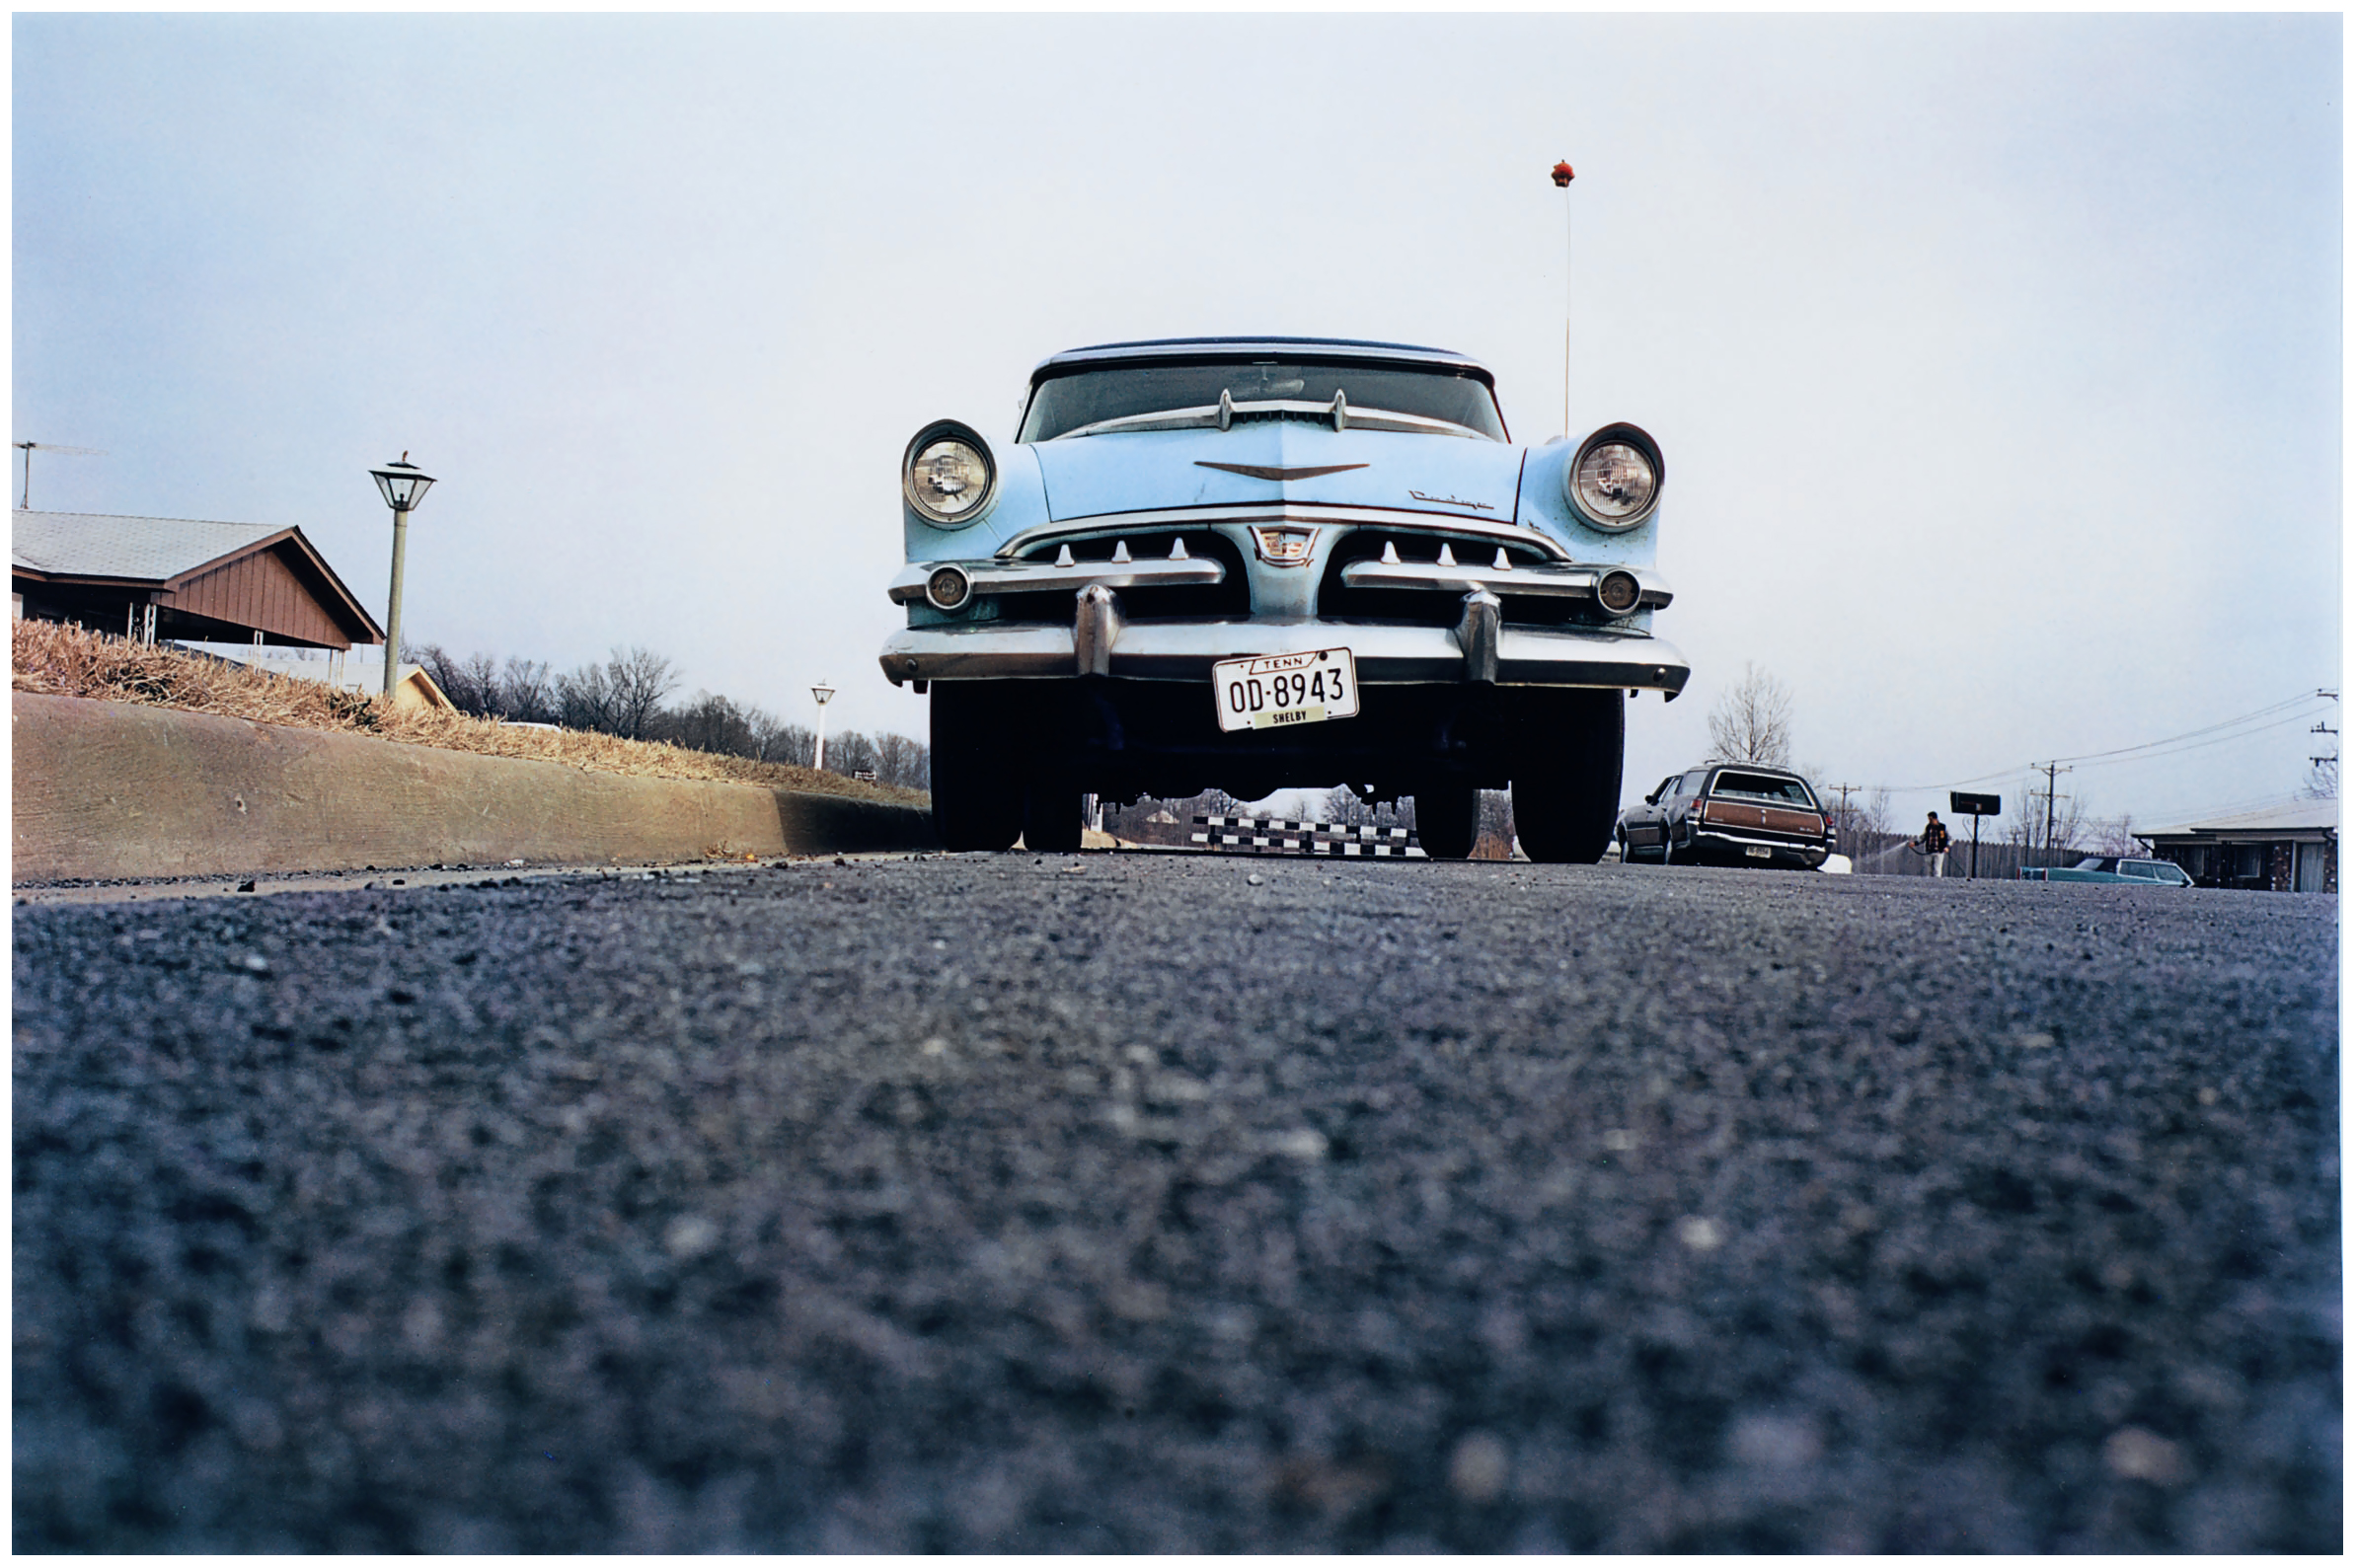 photographersbooks-william-egglestone-27.JPG